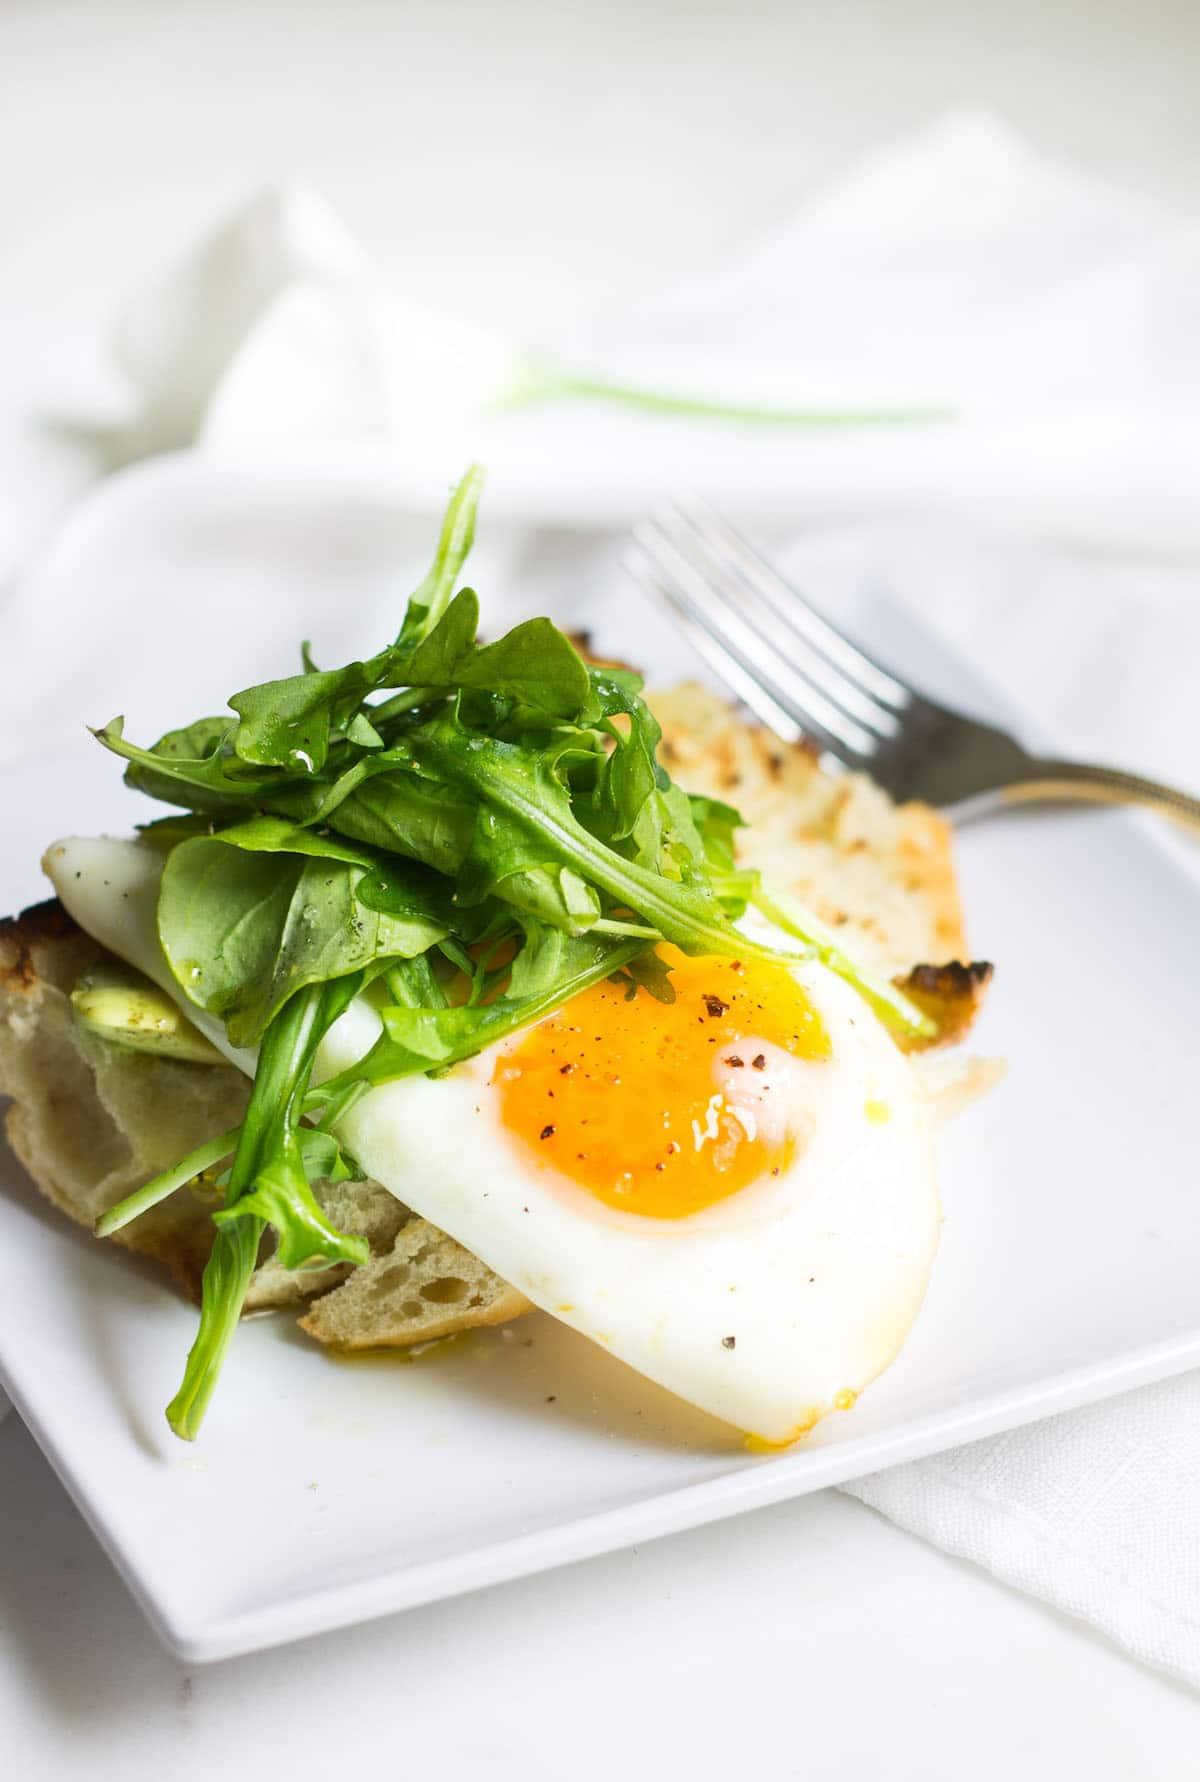 Egg Toast with avocado, arugula, lemon, and olive oil. A perfect breast or lunch! Recipe via MonPetitFour.com